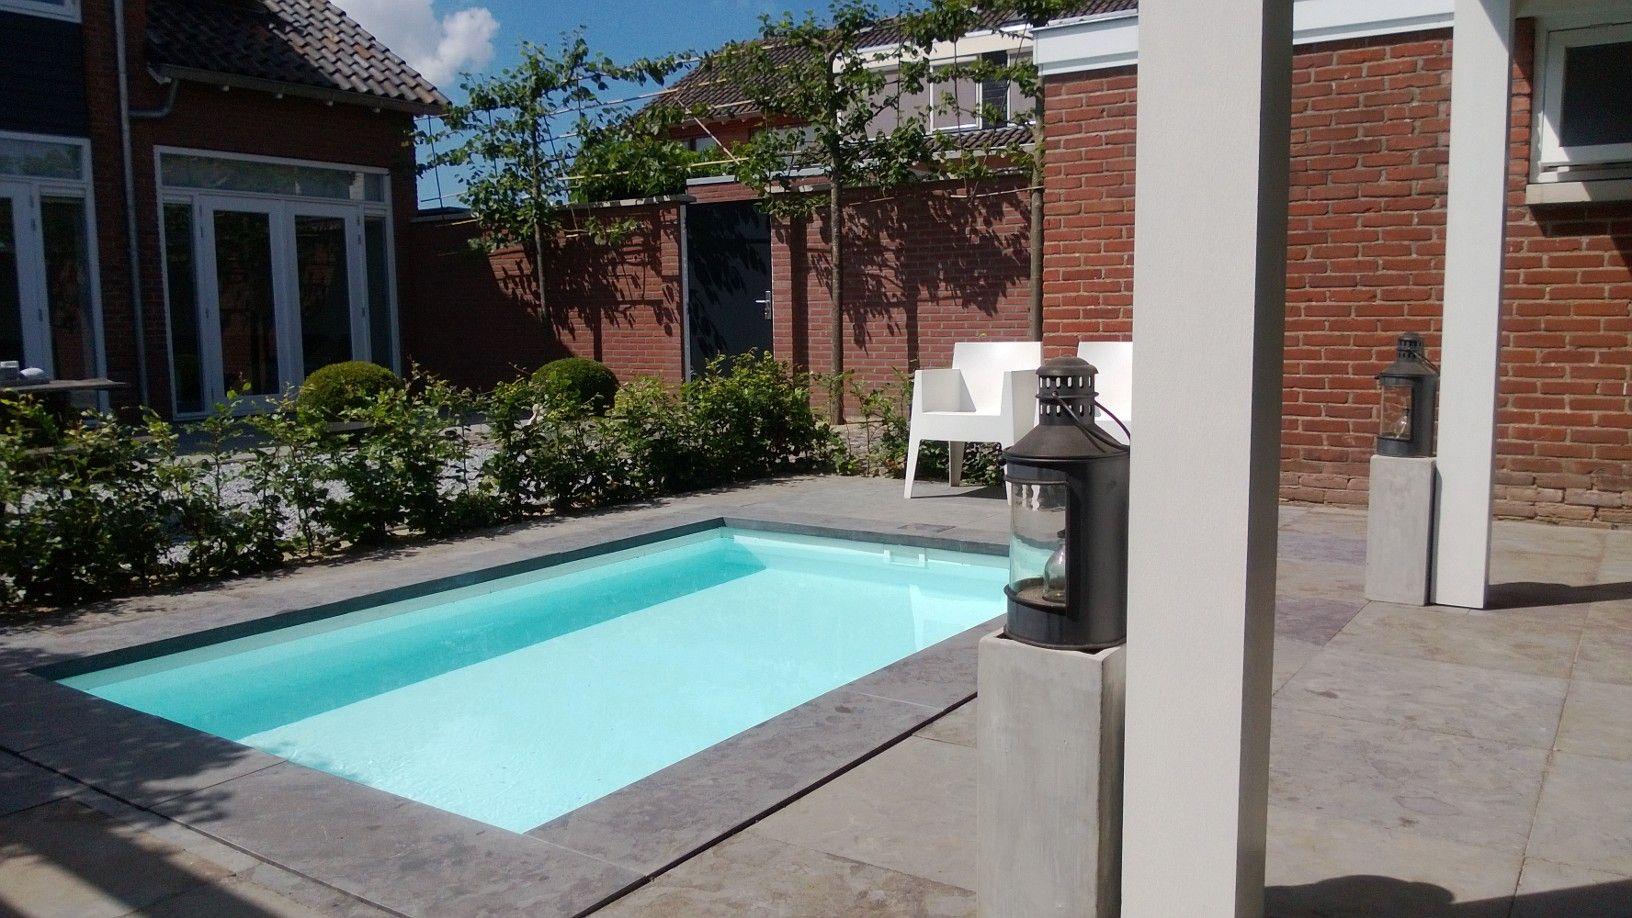 Klein zwembad in een sfeervolle tuin minipool for Mini zwembad